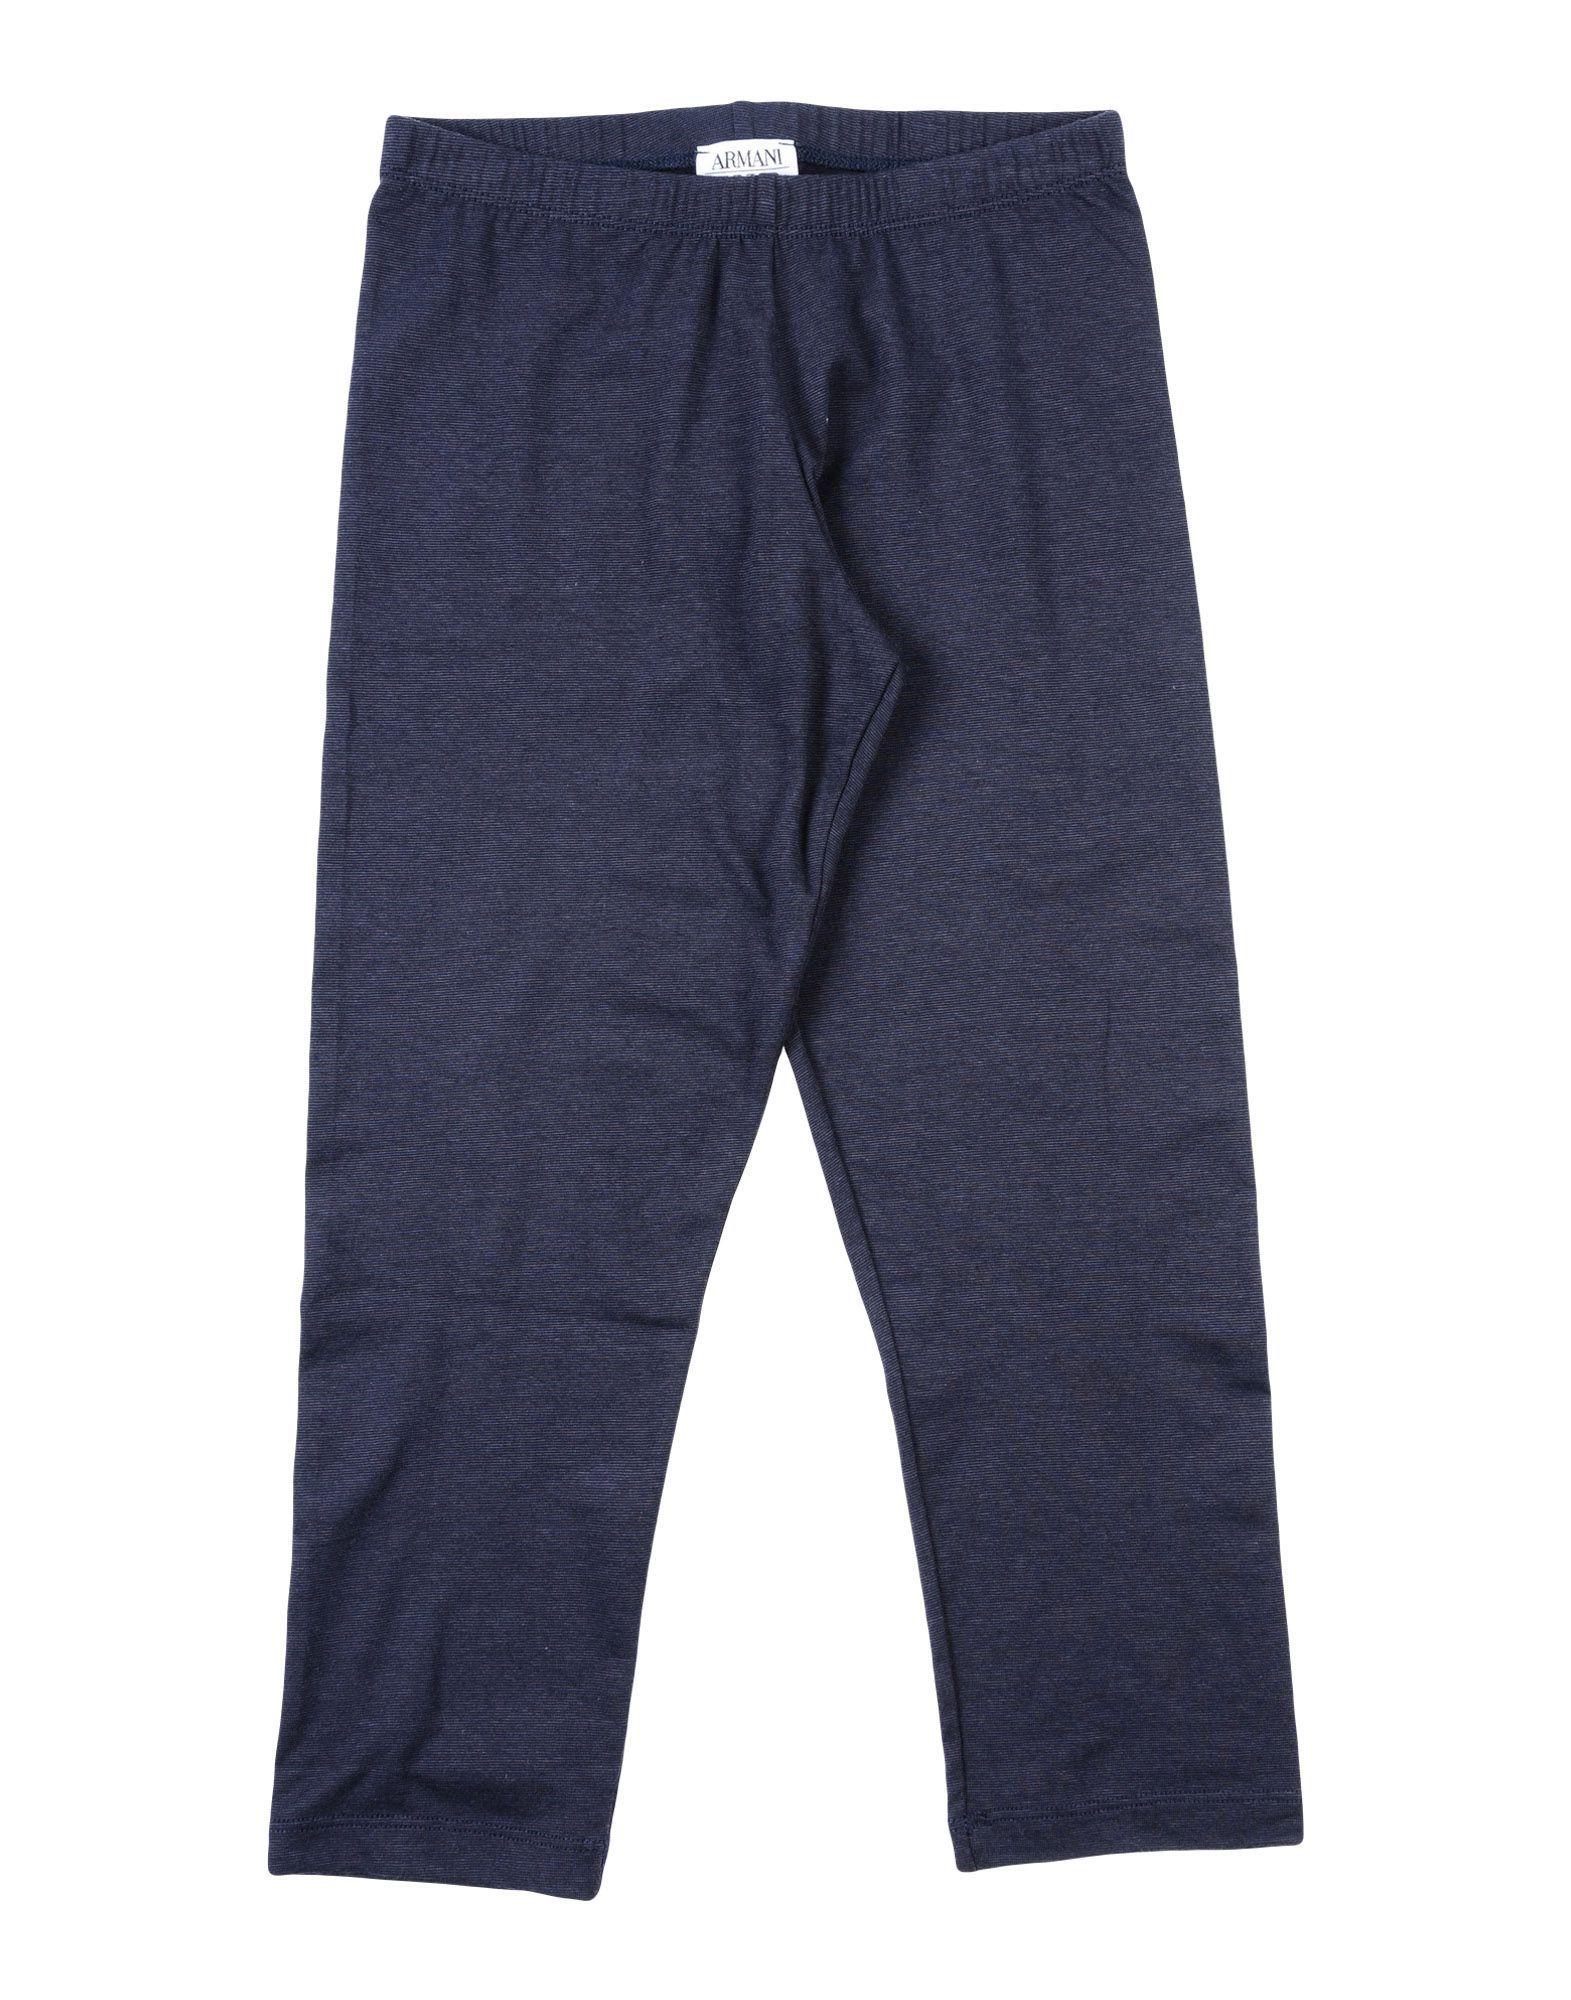 TROUSERS Armani Junior Dark blue Girl Cotton